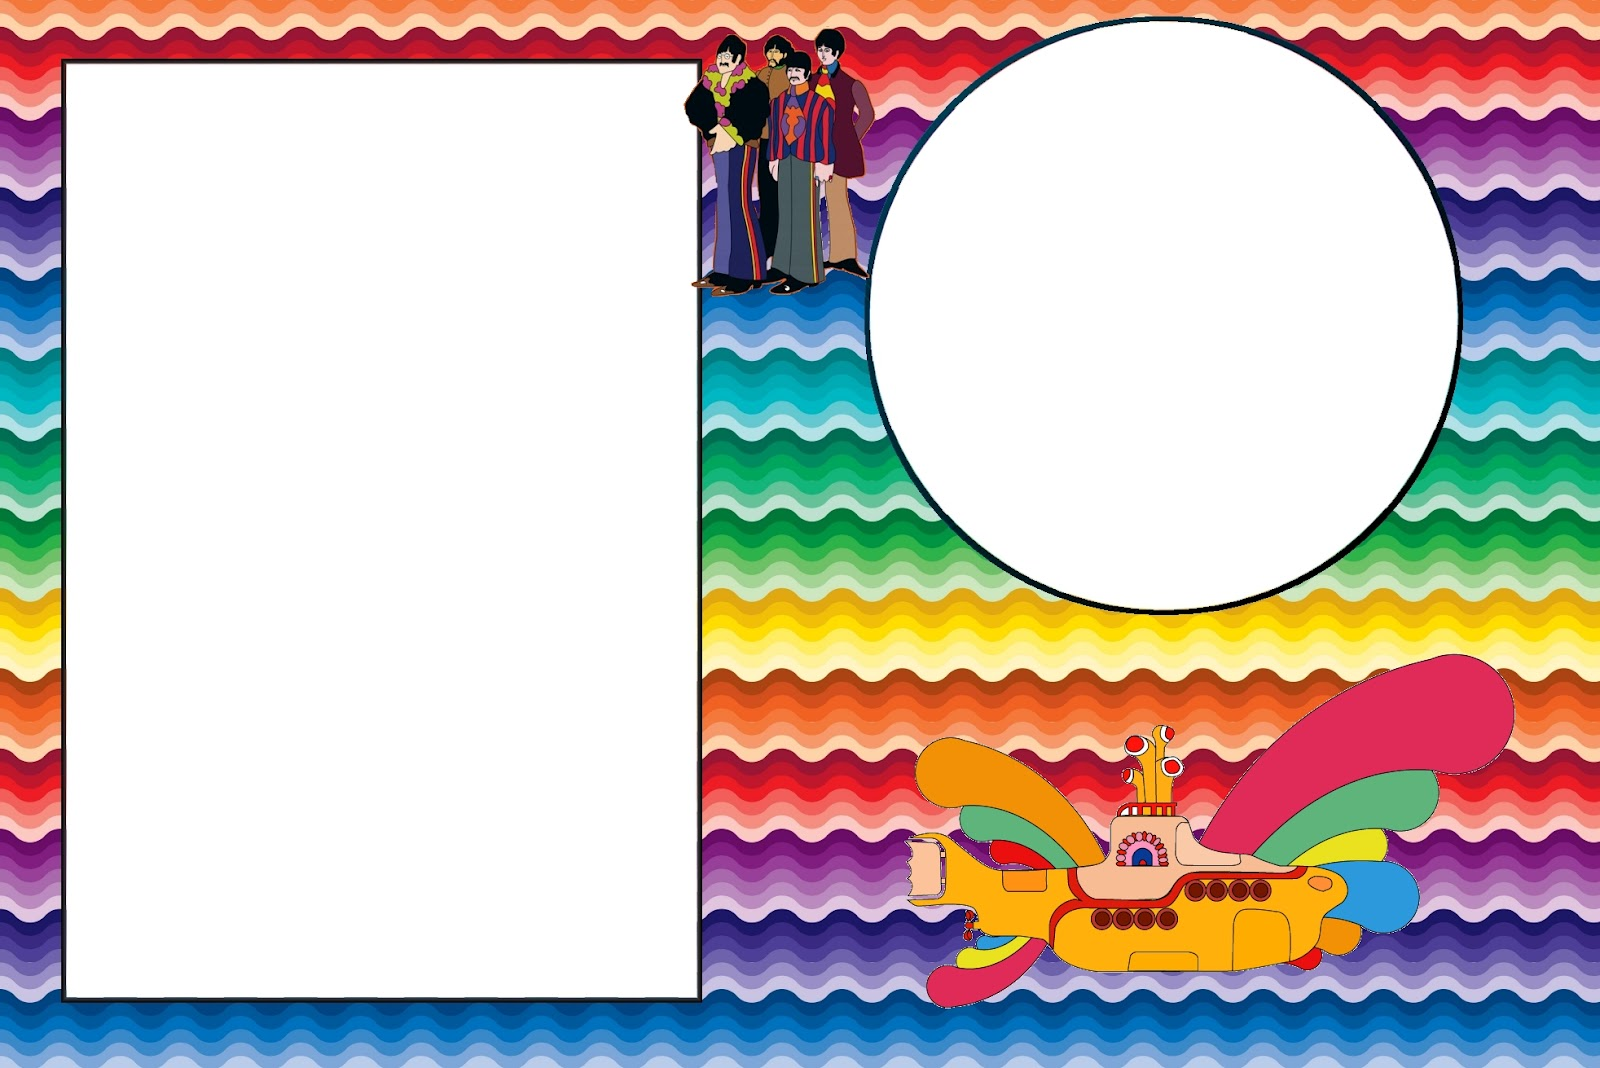 Beatles Yellow Submarine Free Printable Invitations